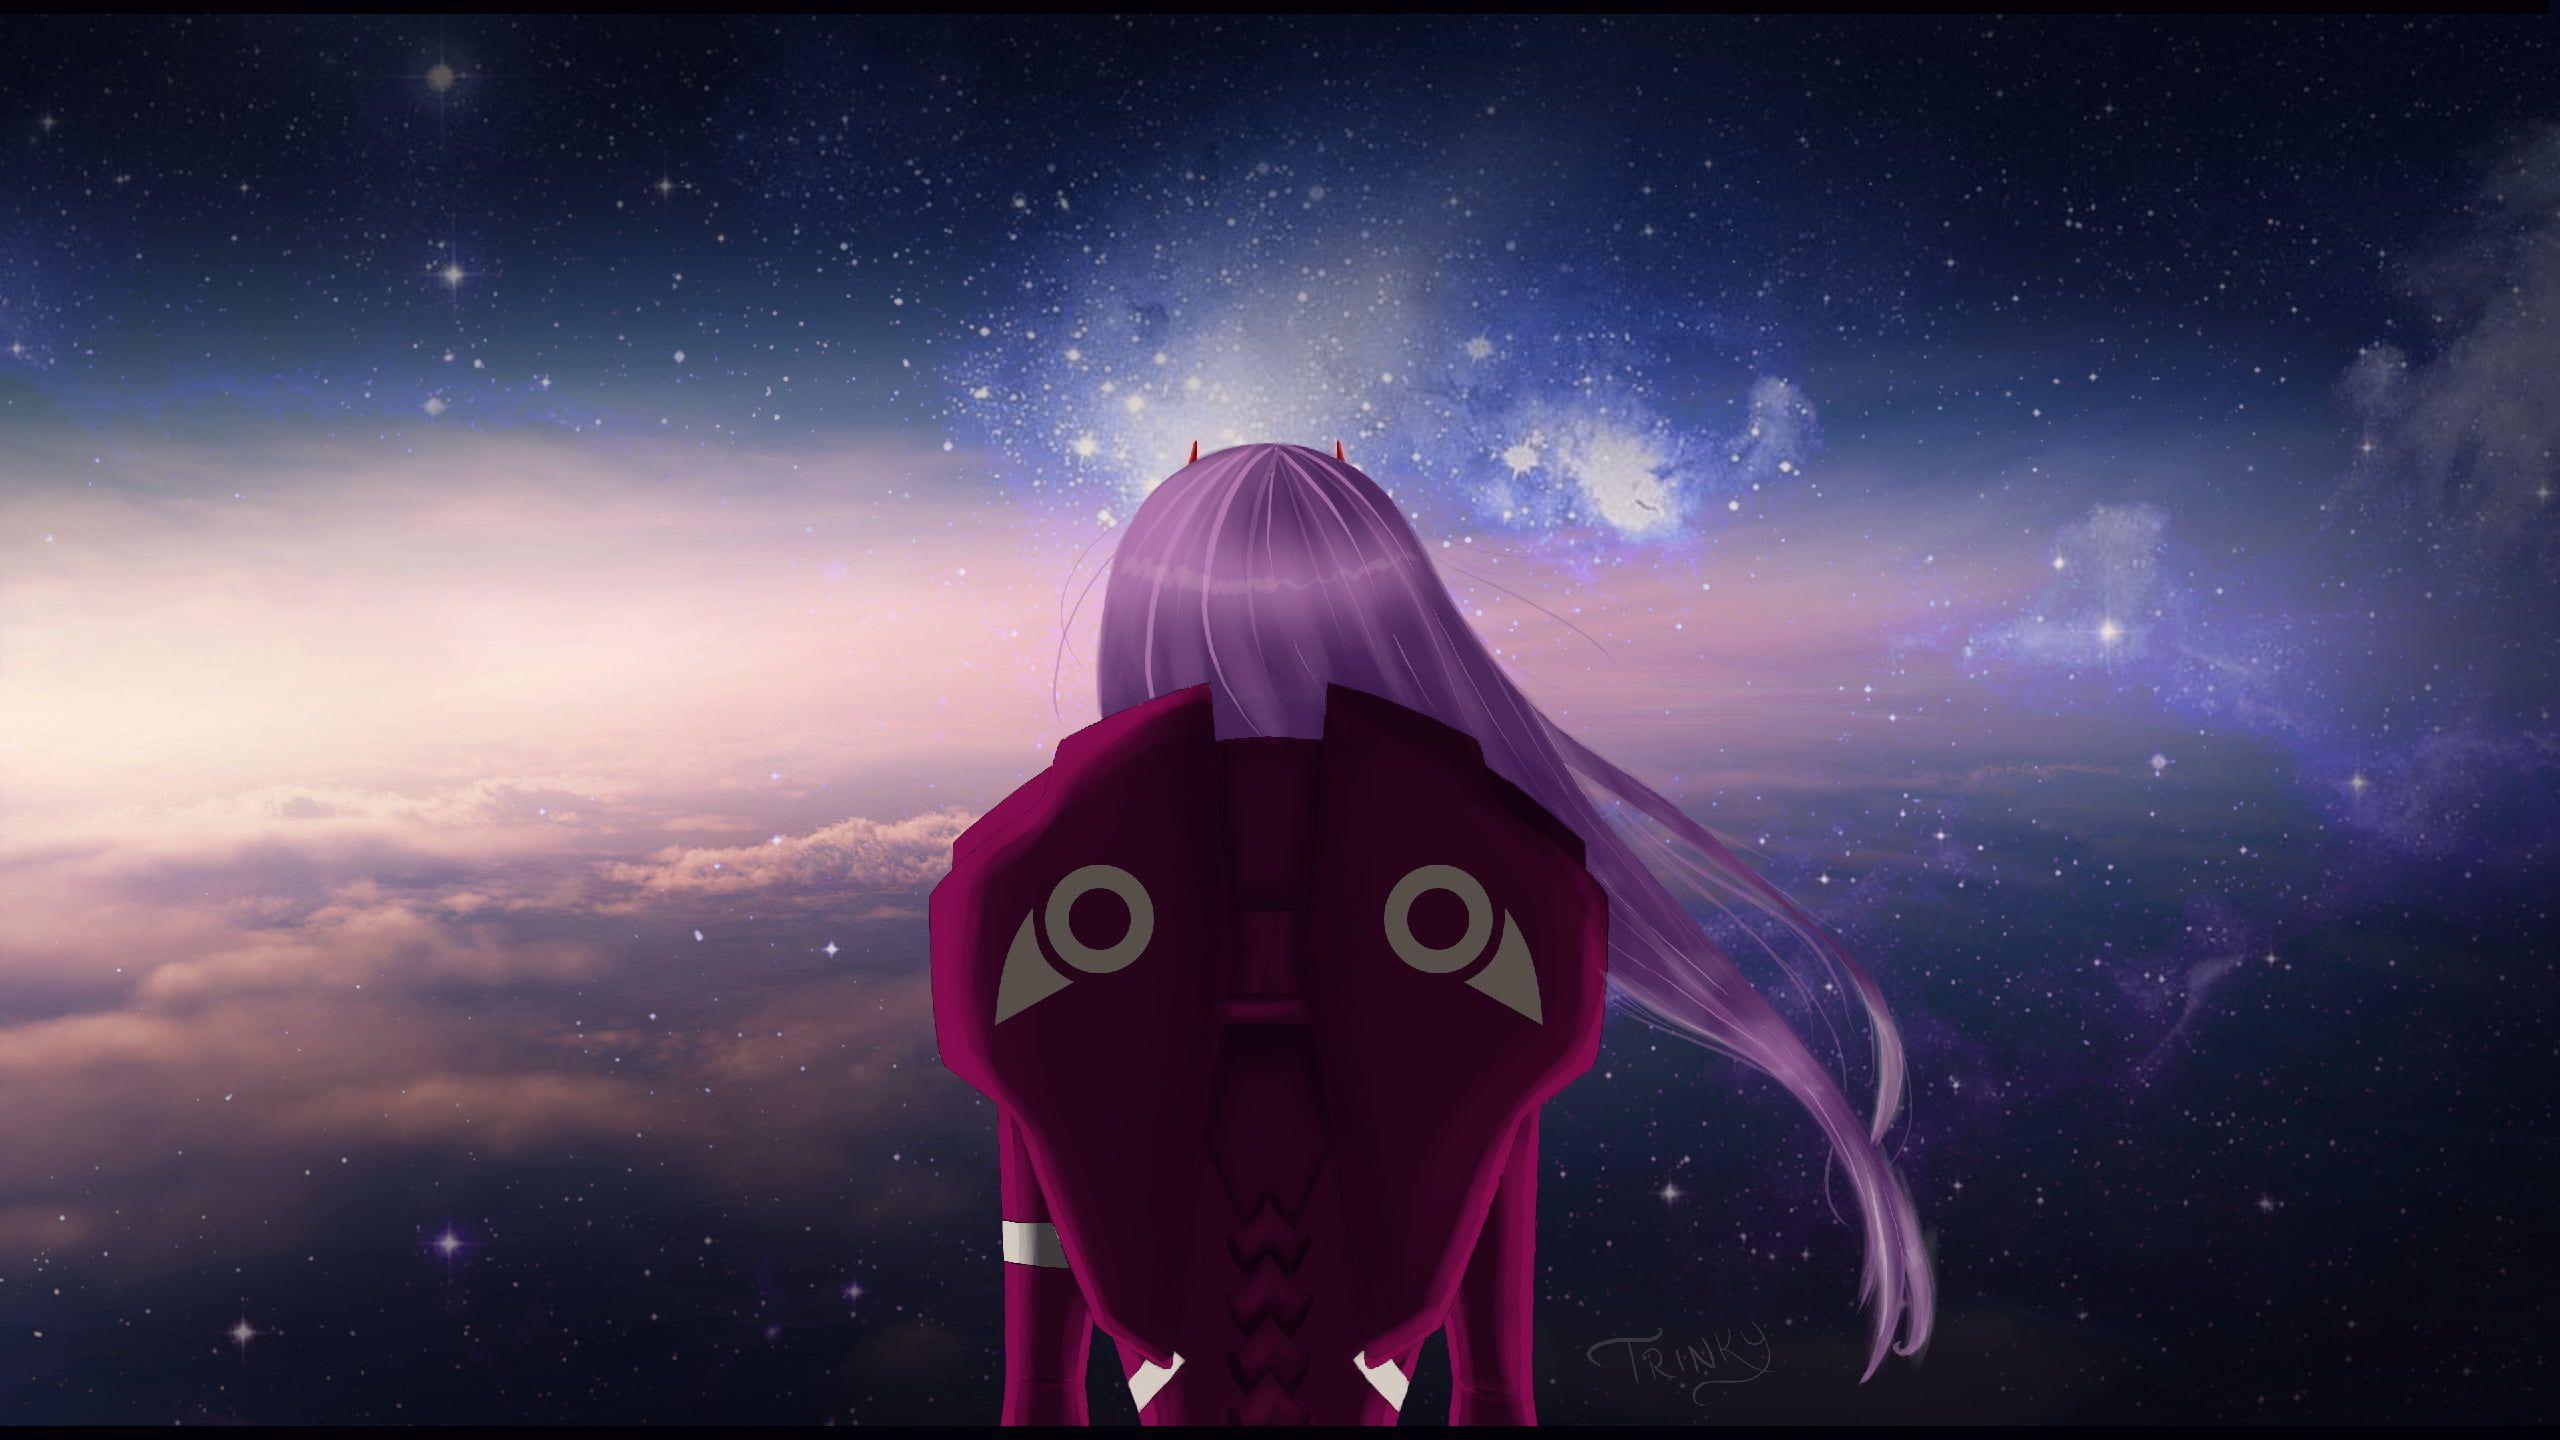 HD wallpaper: Anime, Darling in the FranXX, Zero Two (Darling in the FranXX)